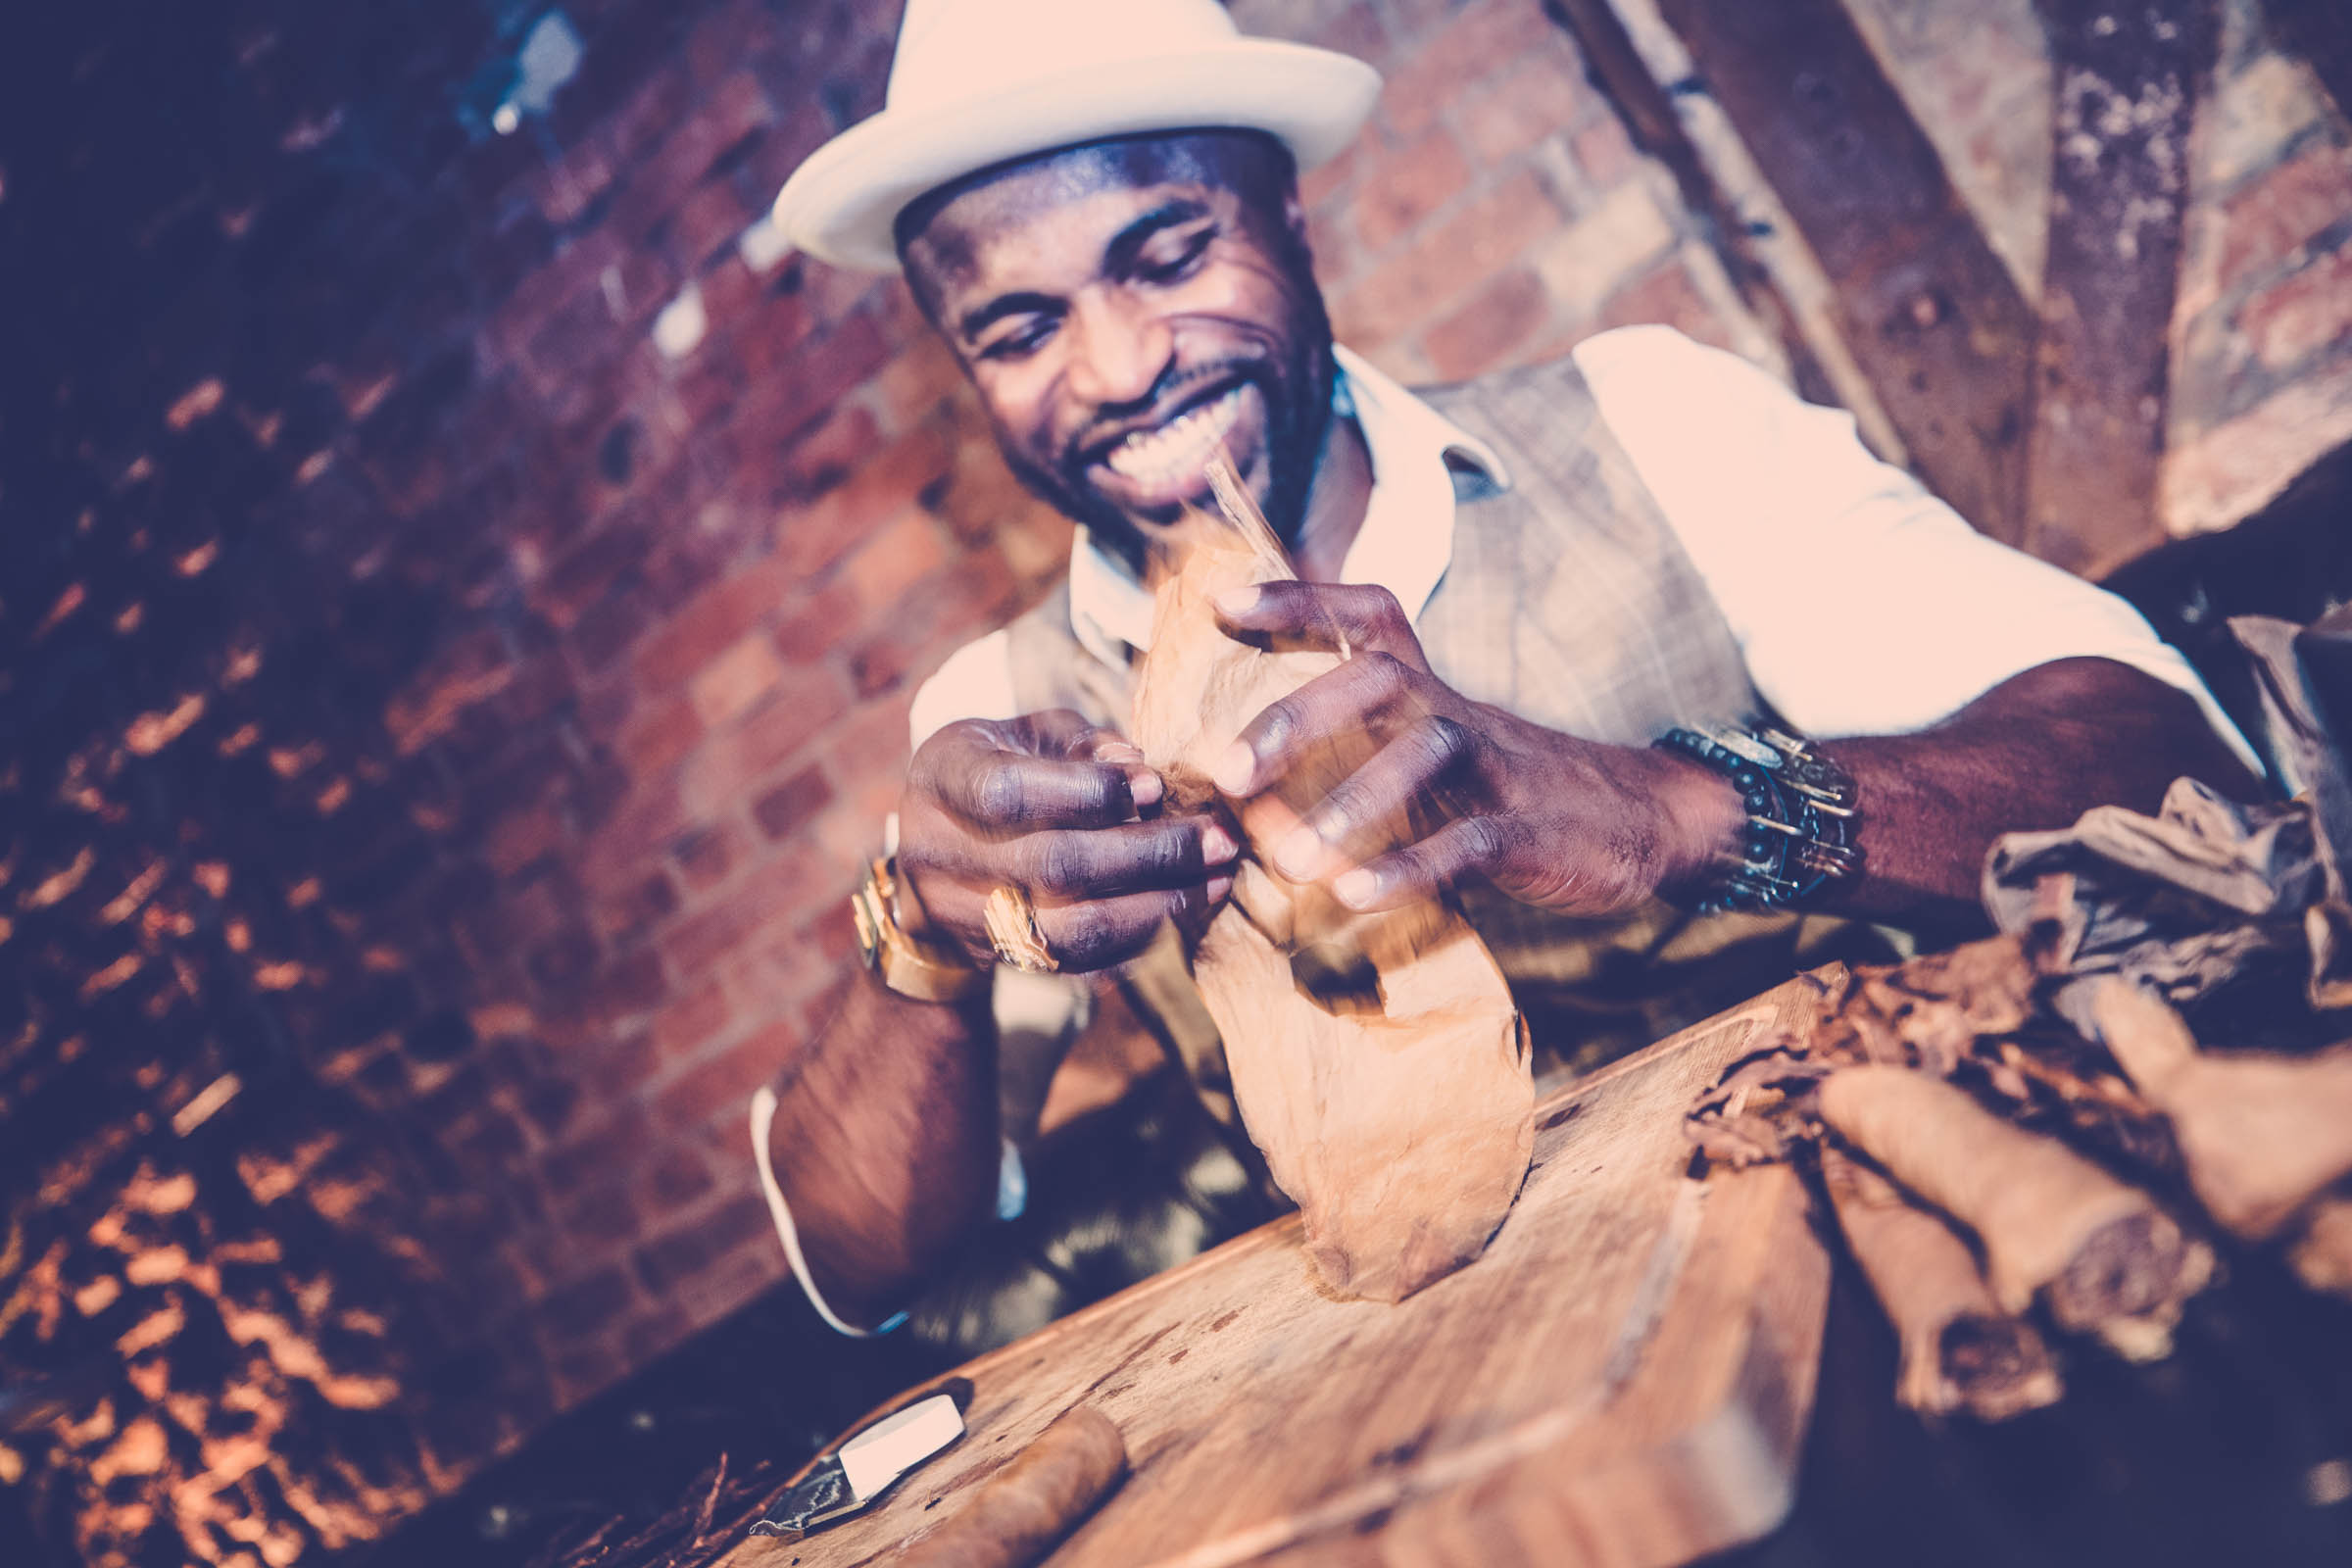 Zigarrenroller - Zigarrendreher | Zigarrenherstellung | Handgemacht | Kuba | Gala | Event | Business | Hochzeit | Messen | Buchen | Mieten | Anfragen